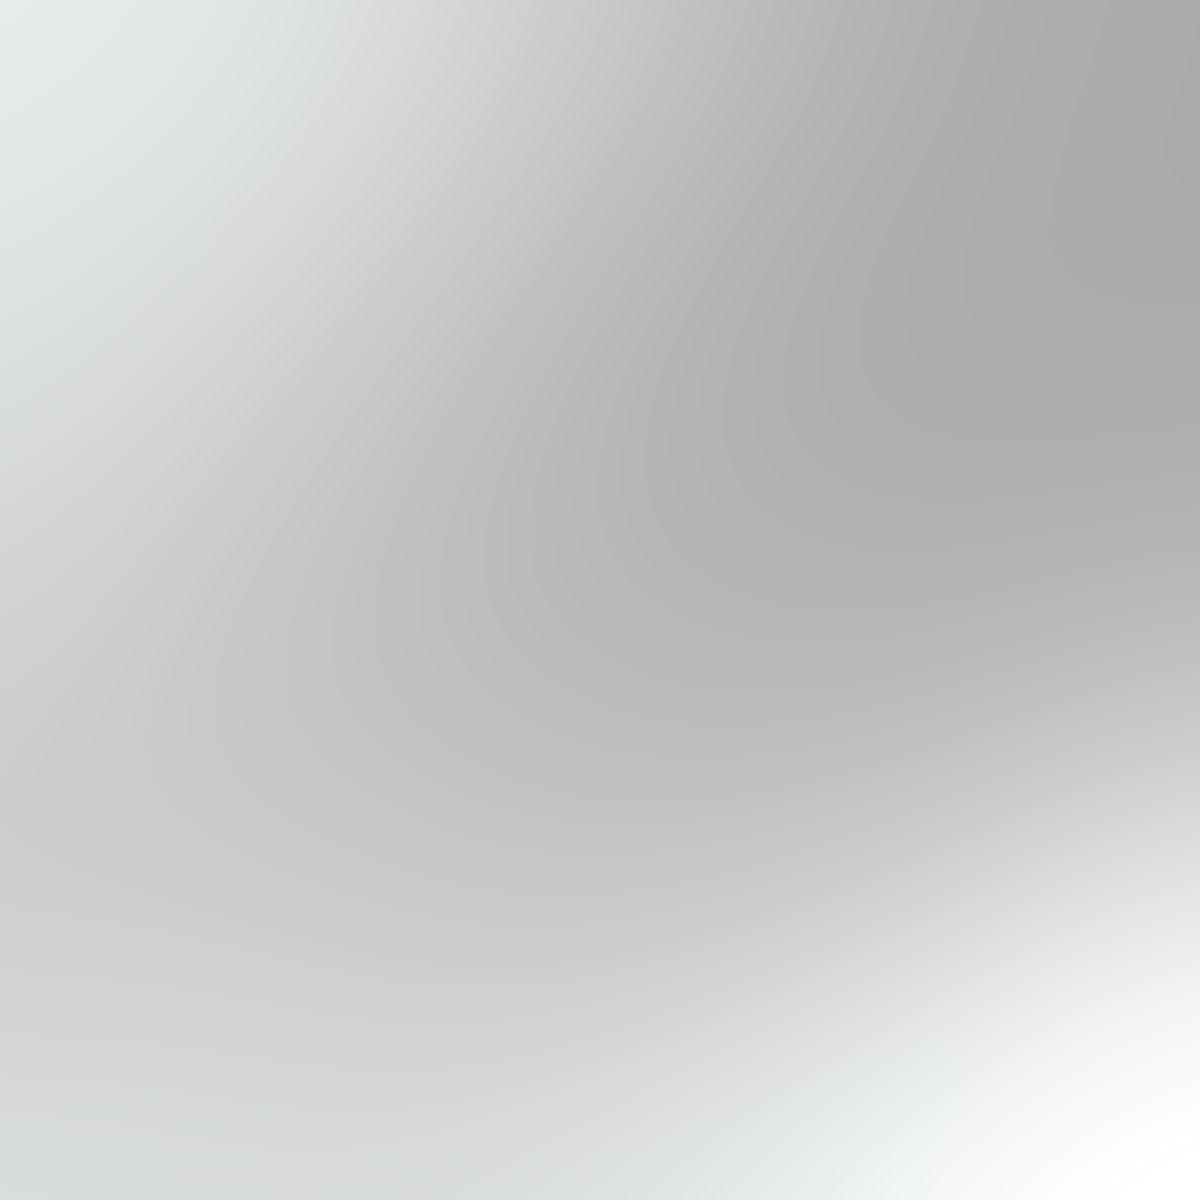 Catellani & Smith Light Stick V LED Wandleuchte, Nickel